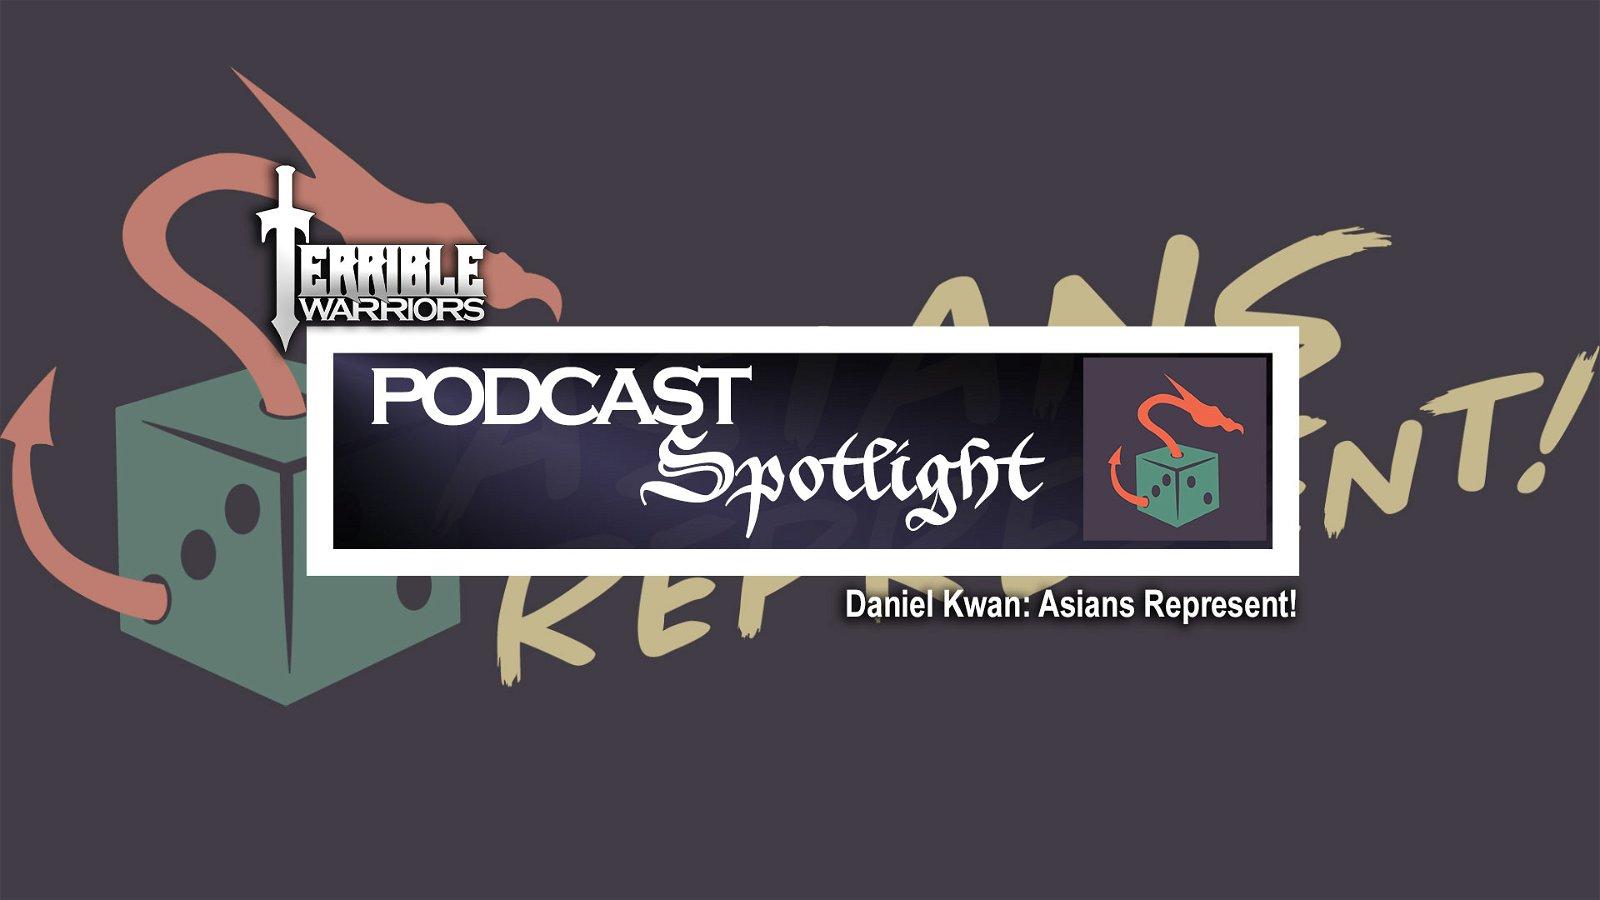 Terrible Warriors Podcast Spotlight: Daniel Kwan (Asians Represent!)